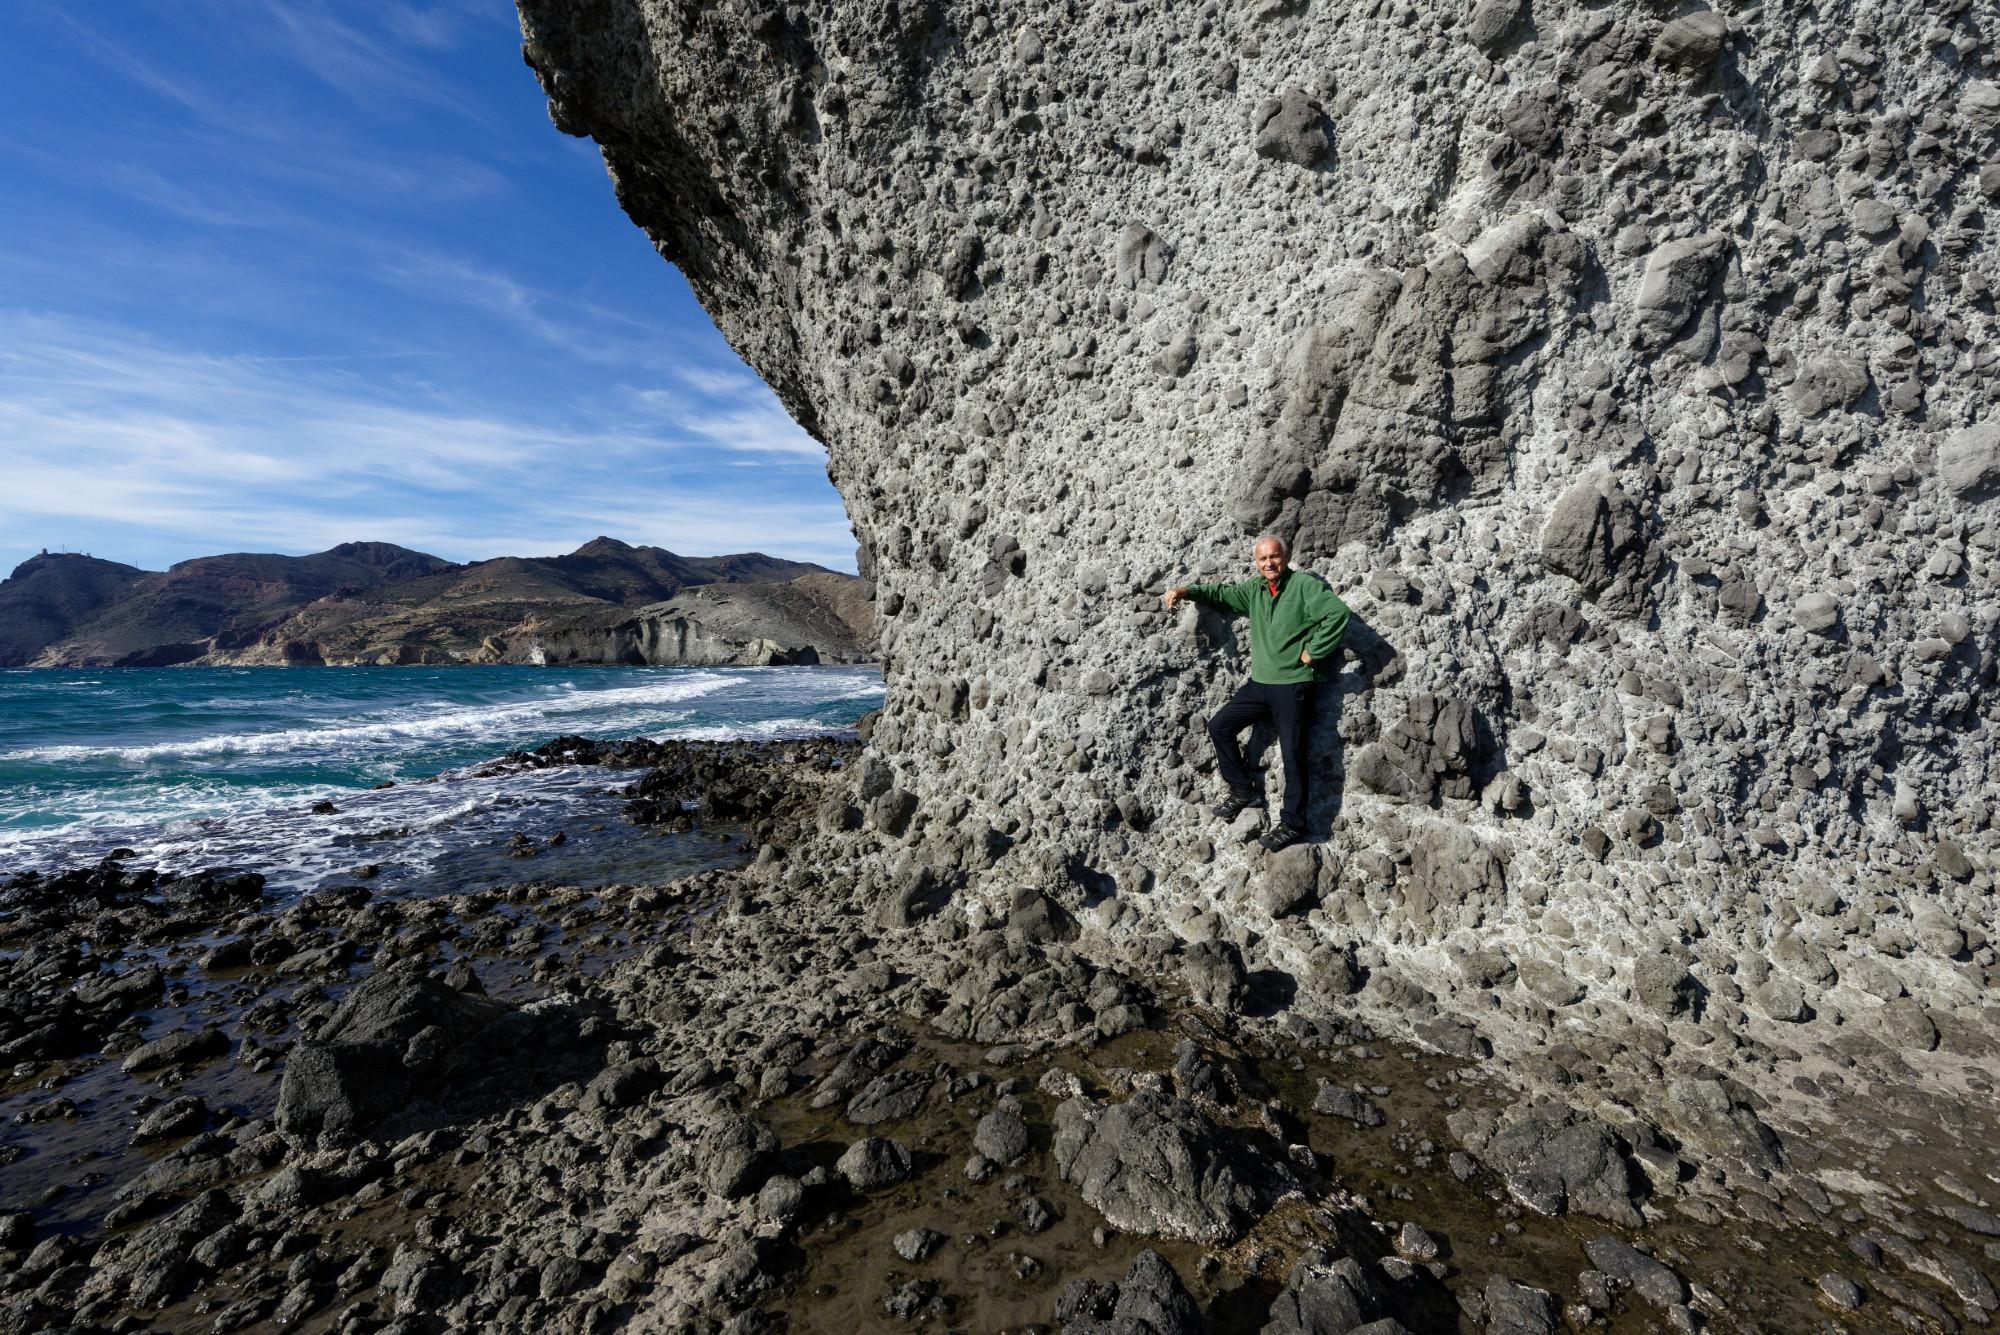 171214-San Jose-Playa del Monsul (Cabo de Gata-Andalousie) (175)